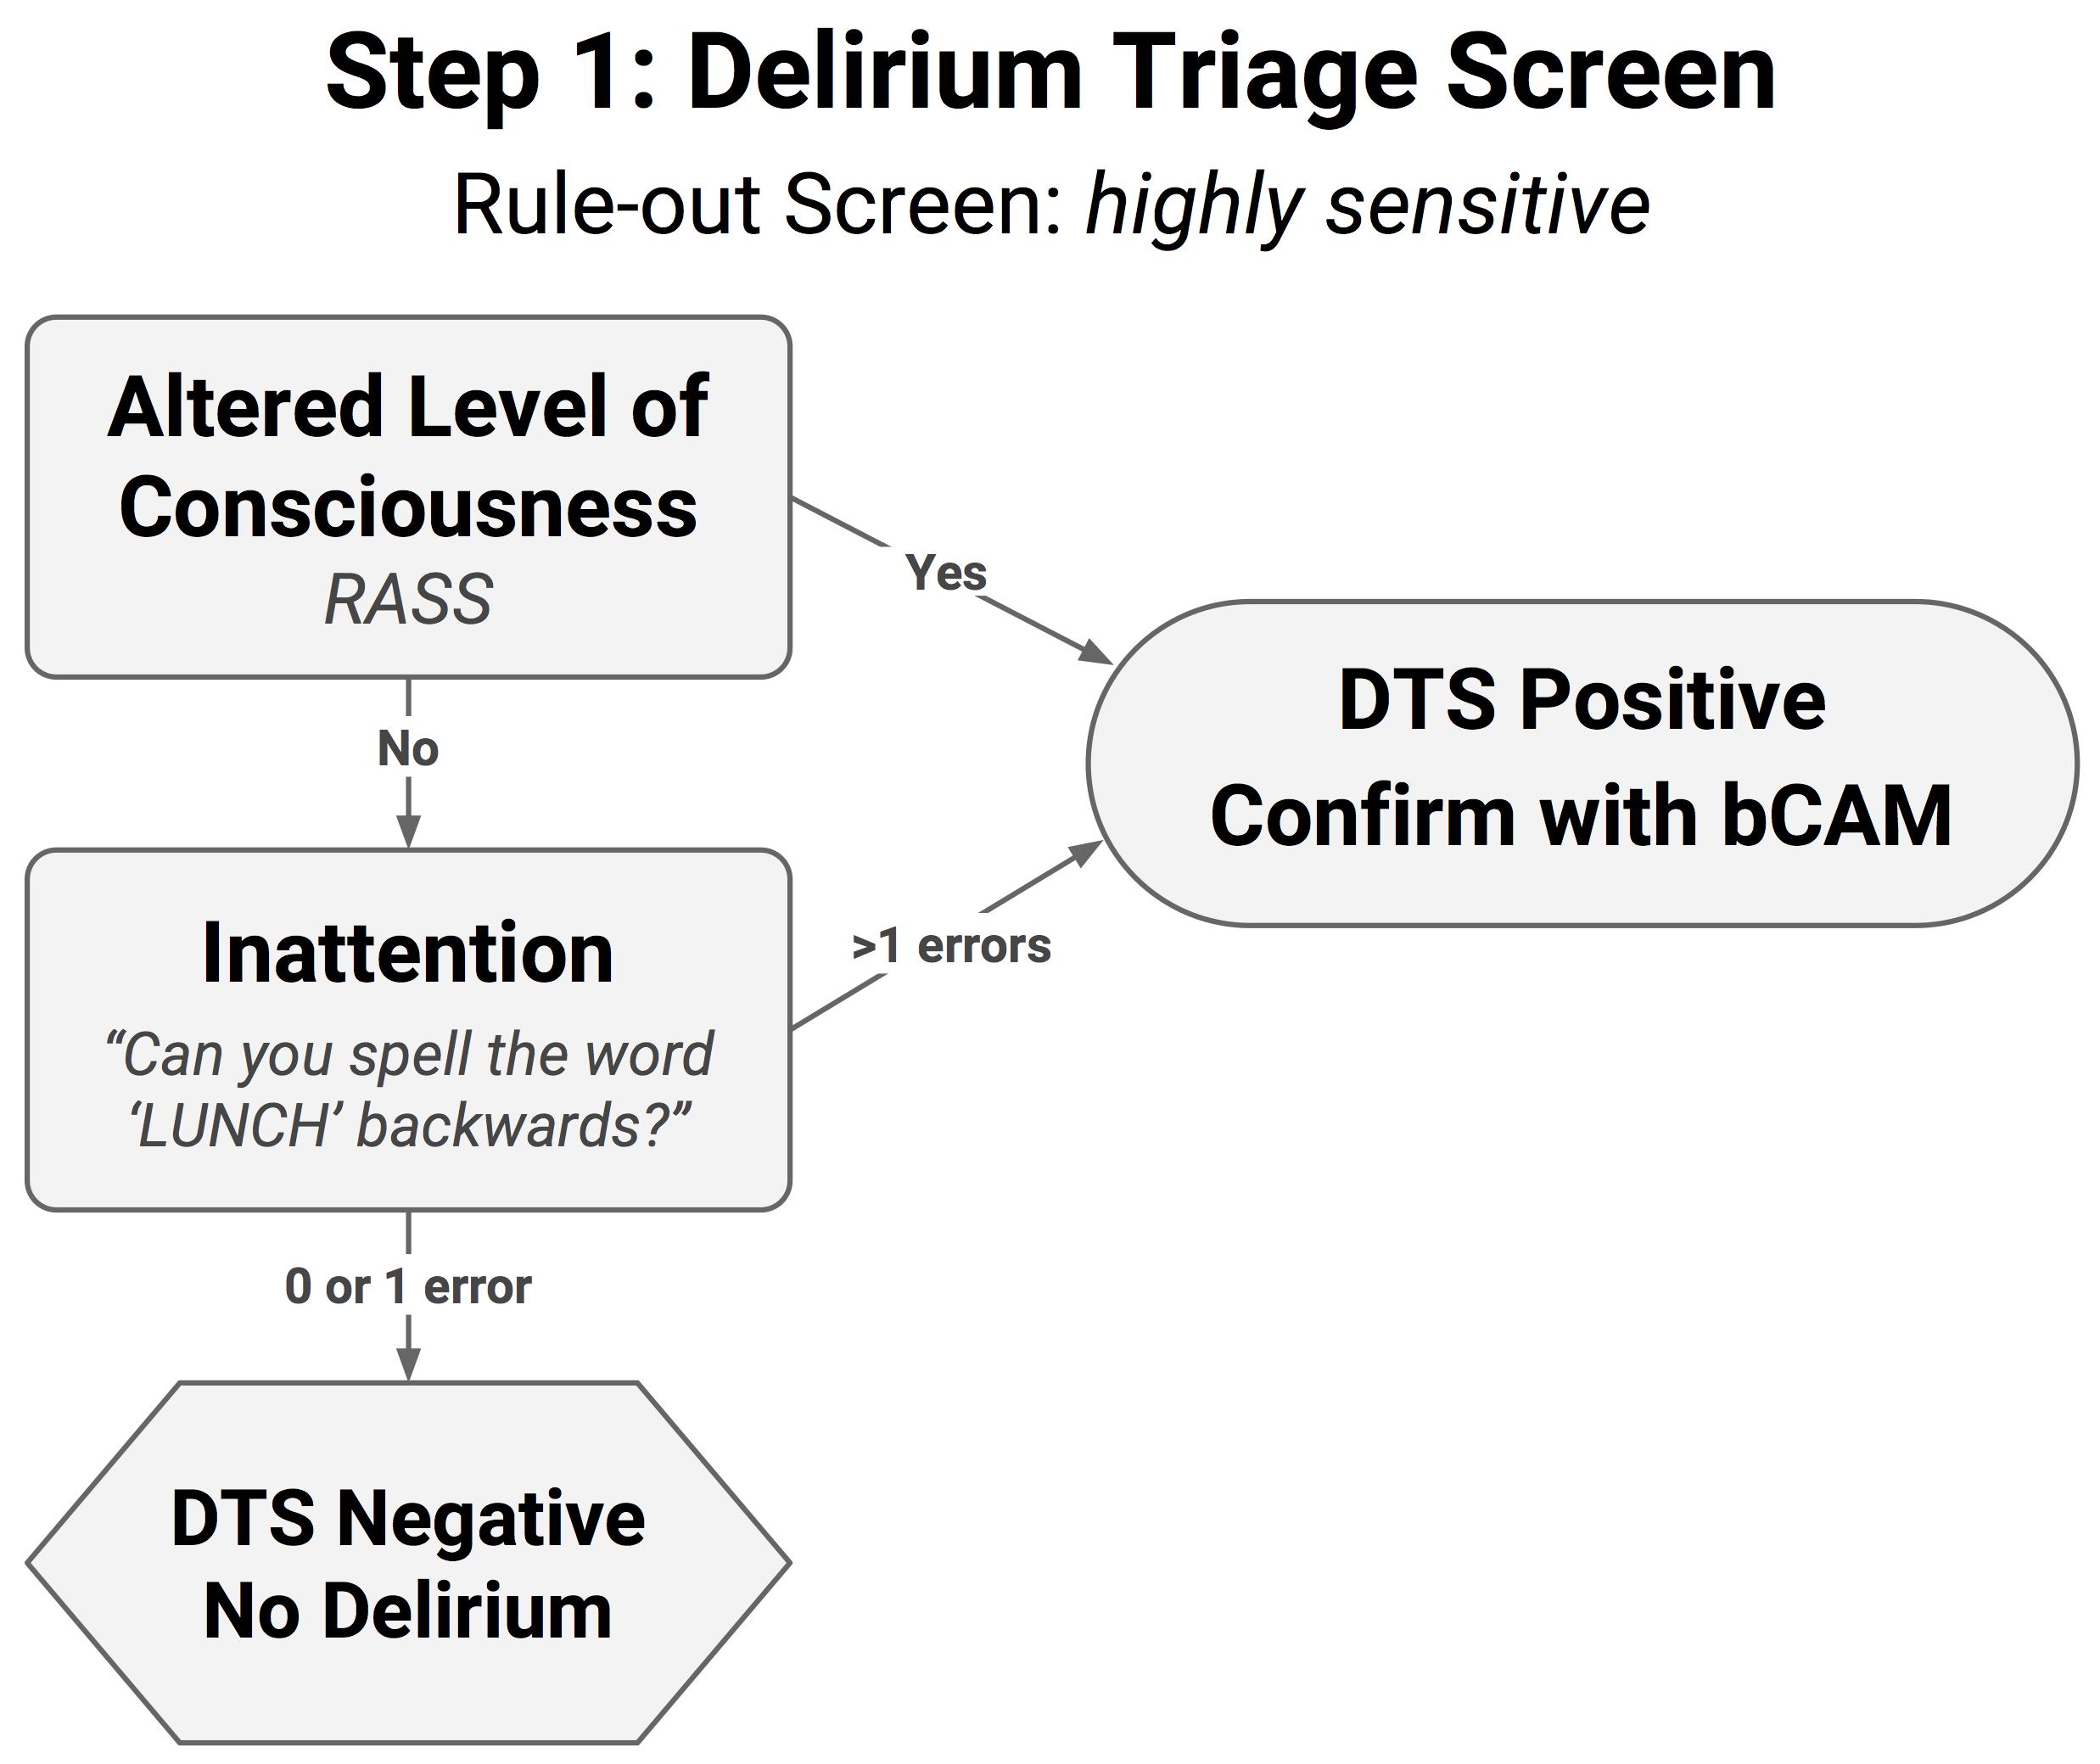 Diagram 2.  Delirium Triage Screen (DTS)